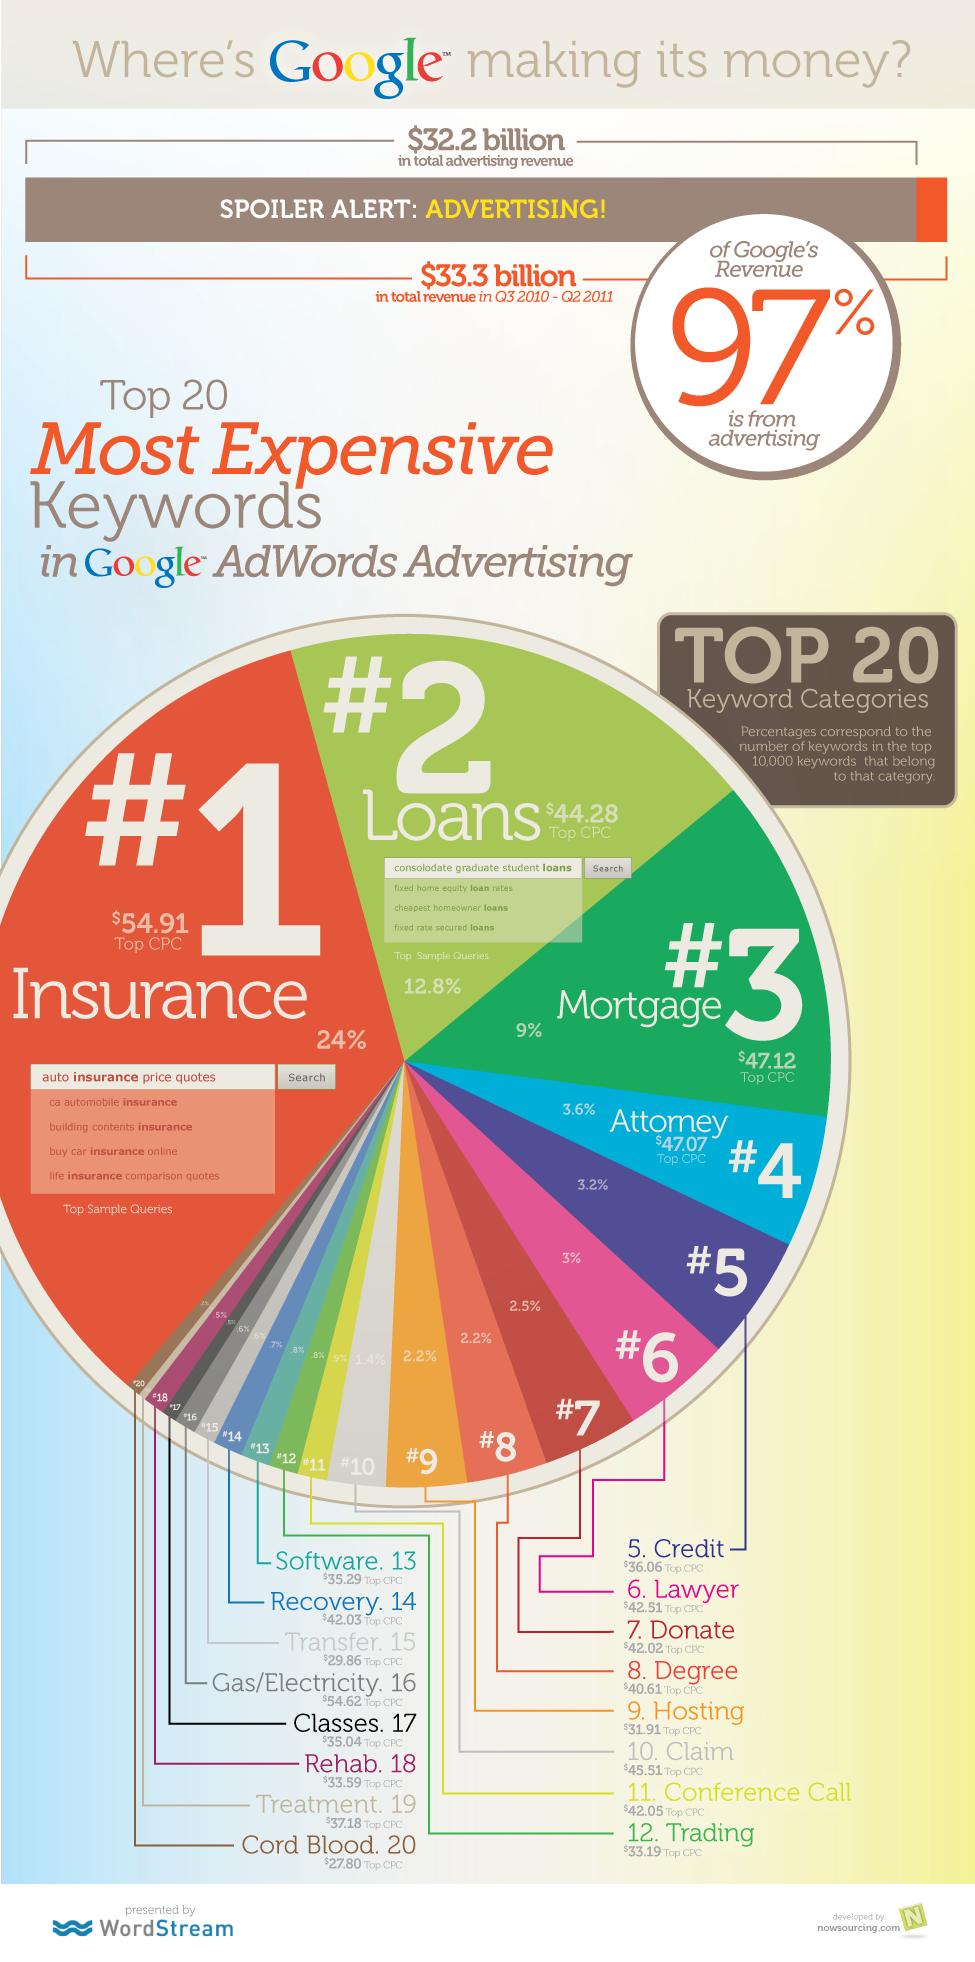 Google Adwords Cost of Keywords - GOOGLE ADWORDS MANAGMENT - St. Charles, MO